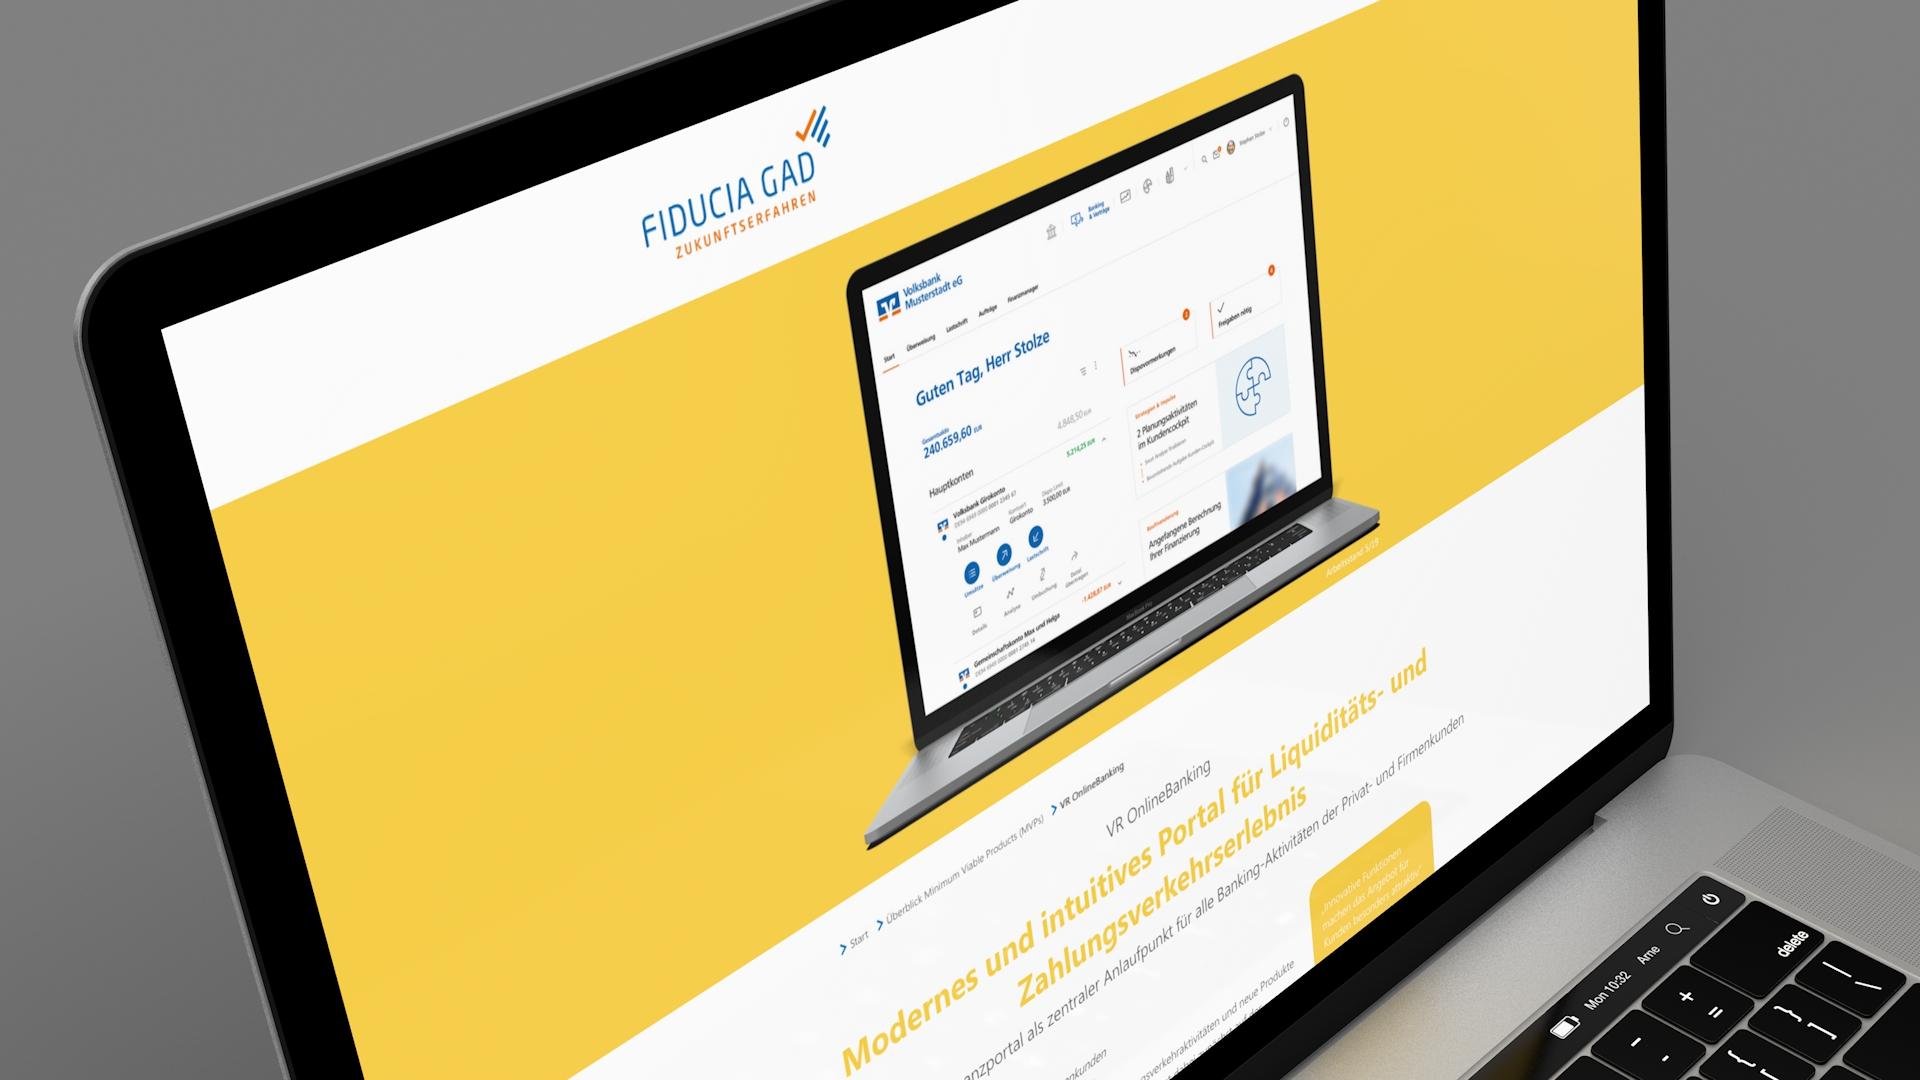 FIDU_Digitale_Vertriebsplattform_04